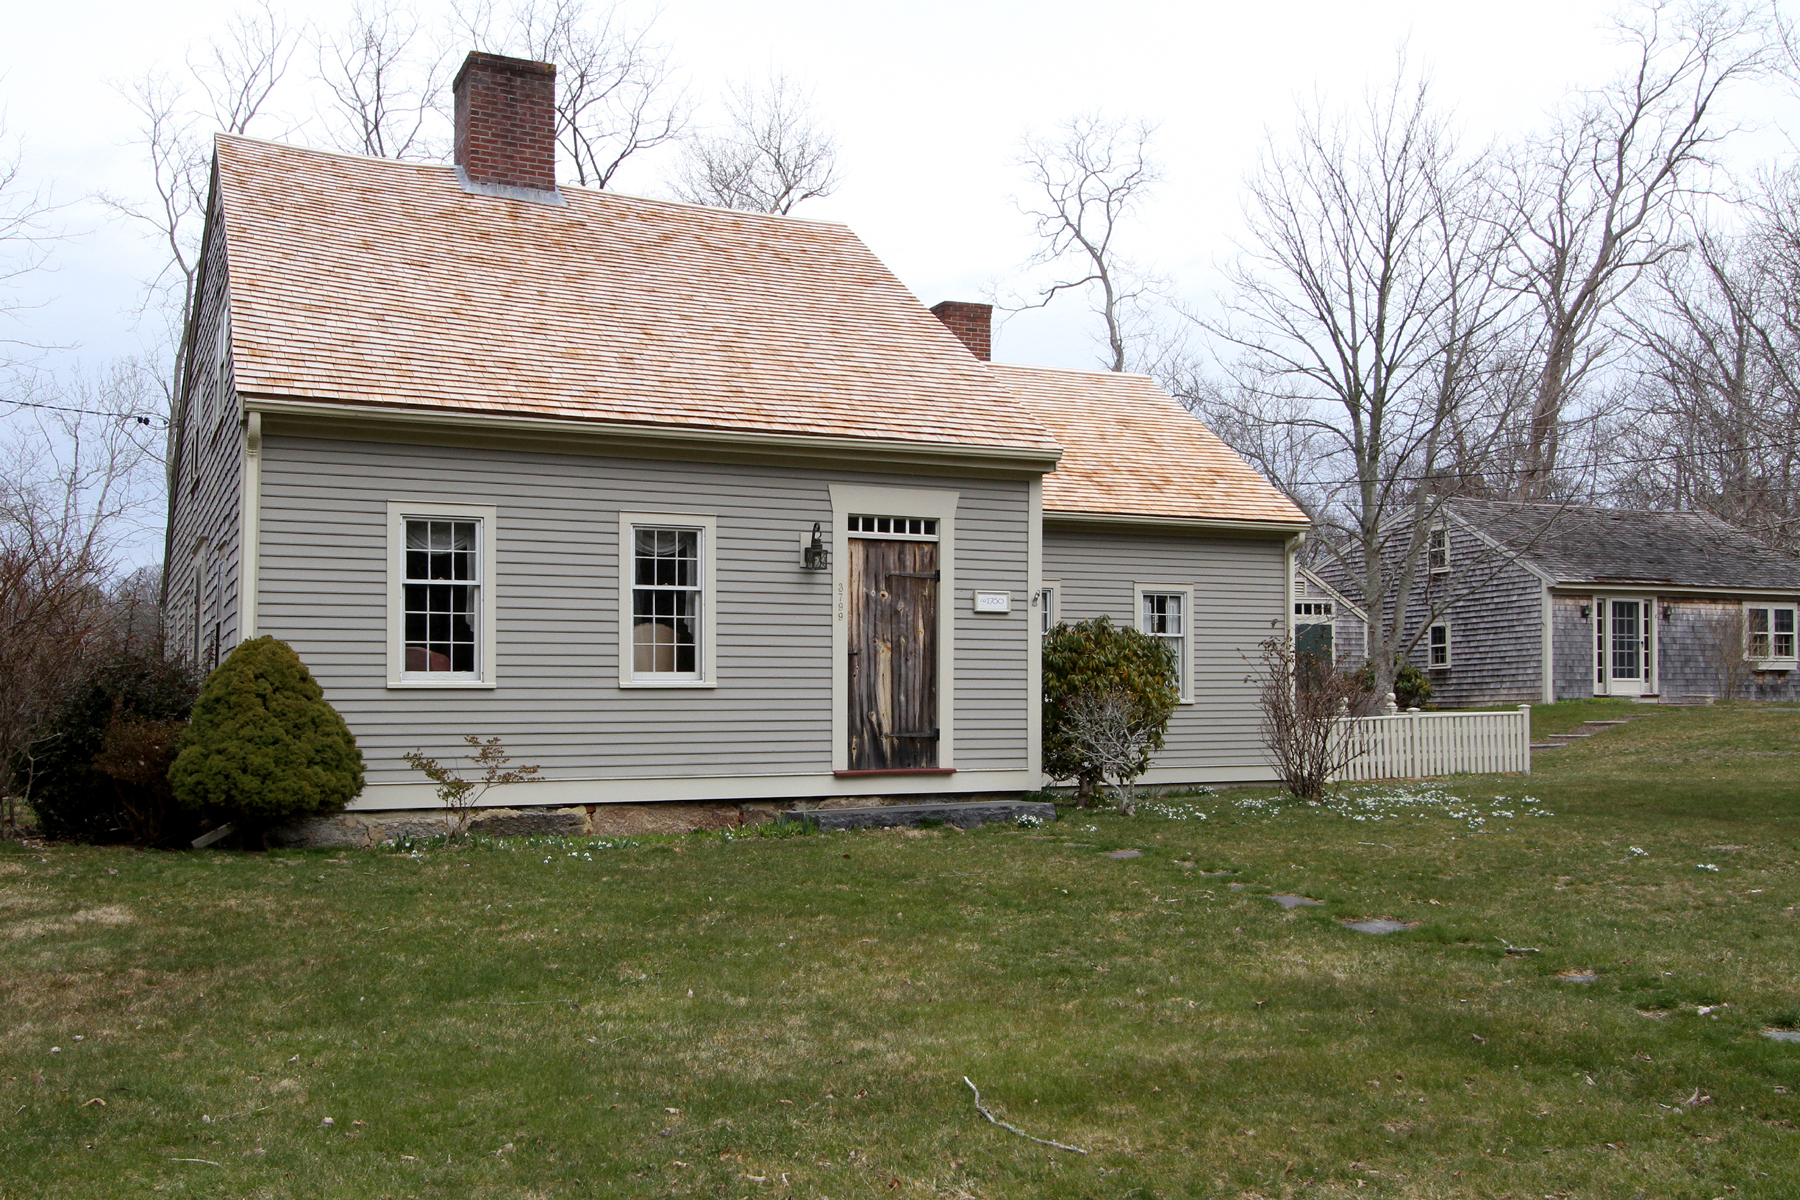 sales property at 3799 Main Street, Brewster, MA